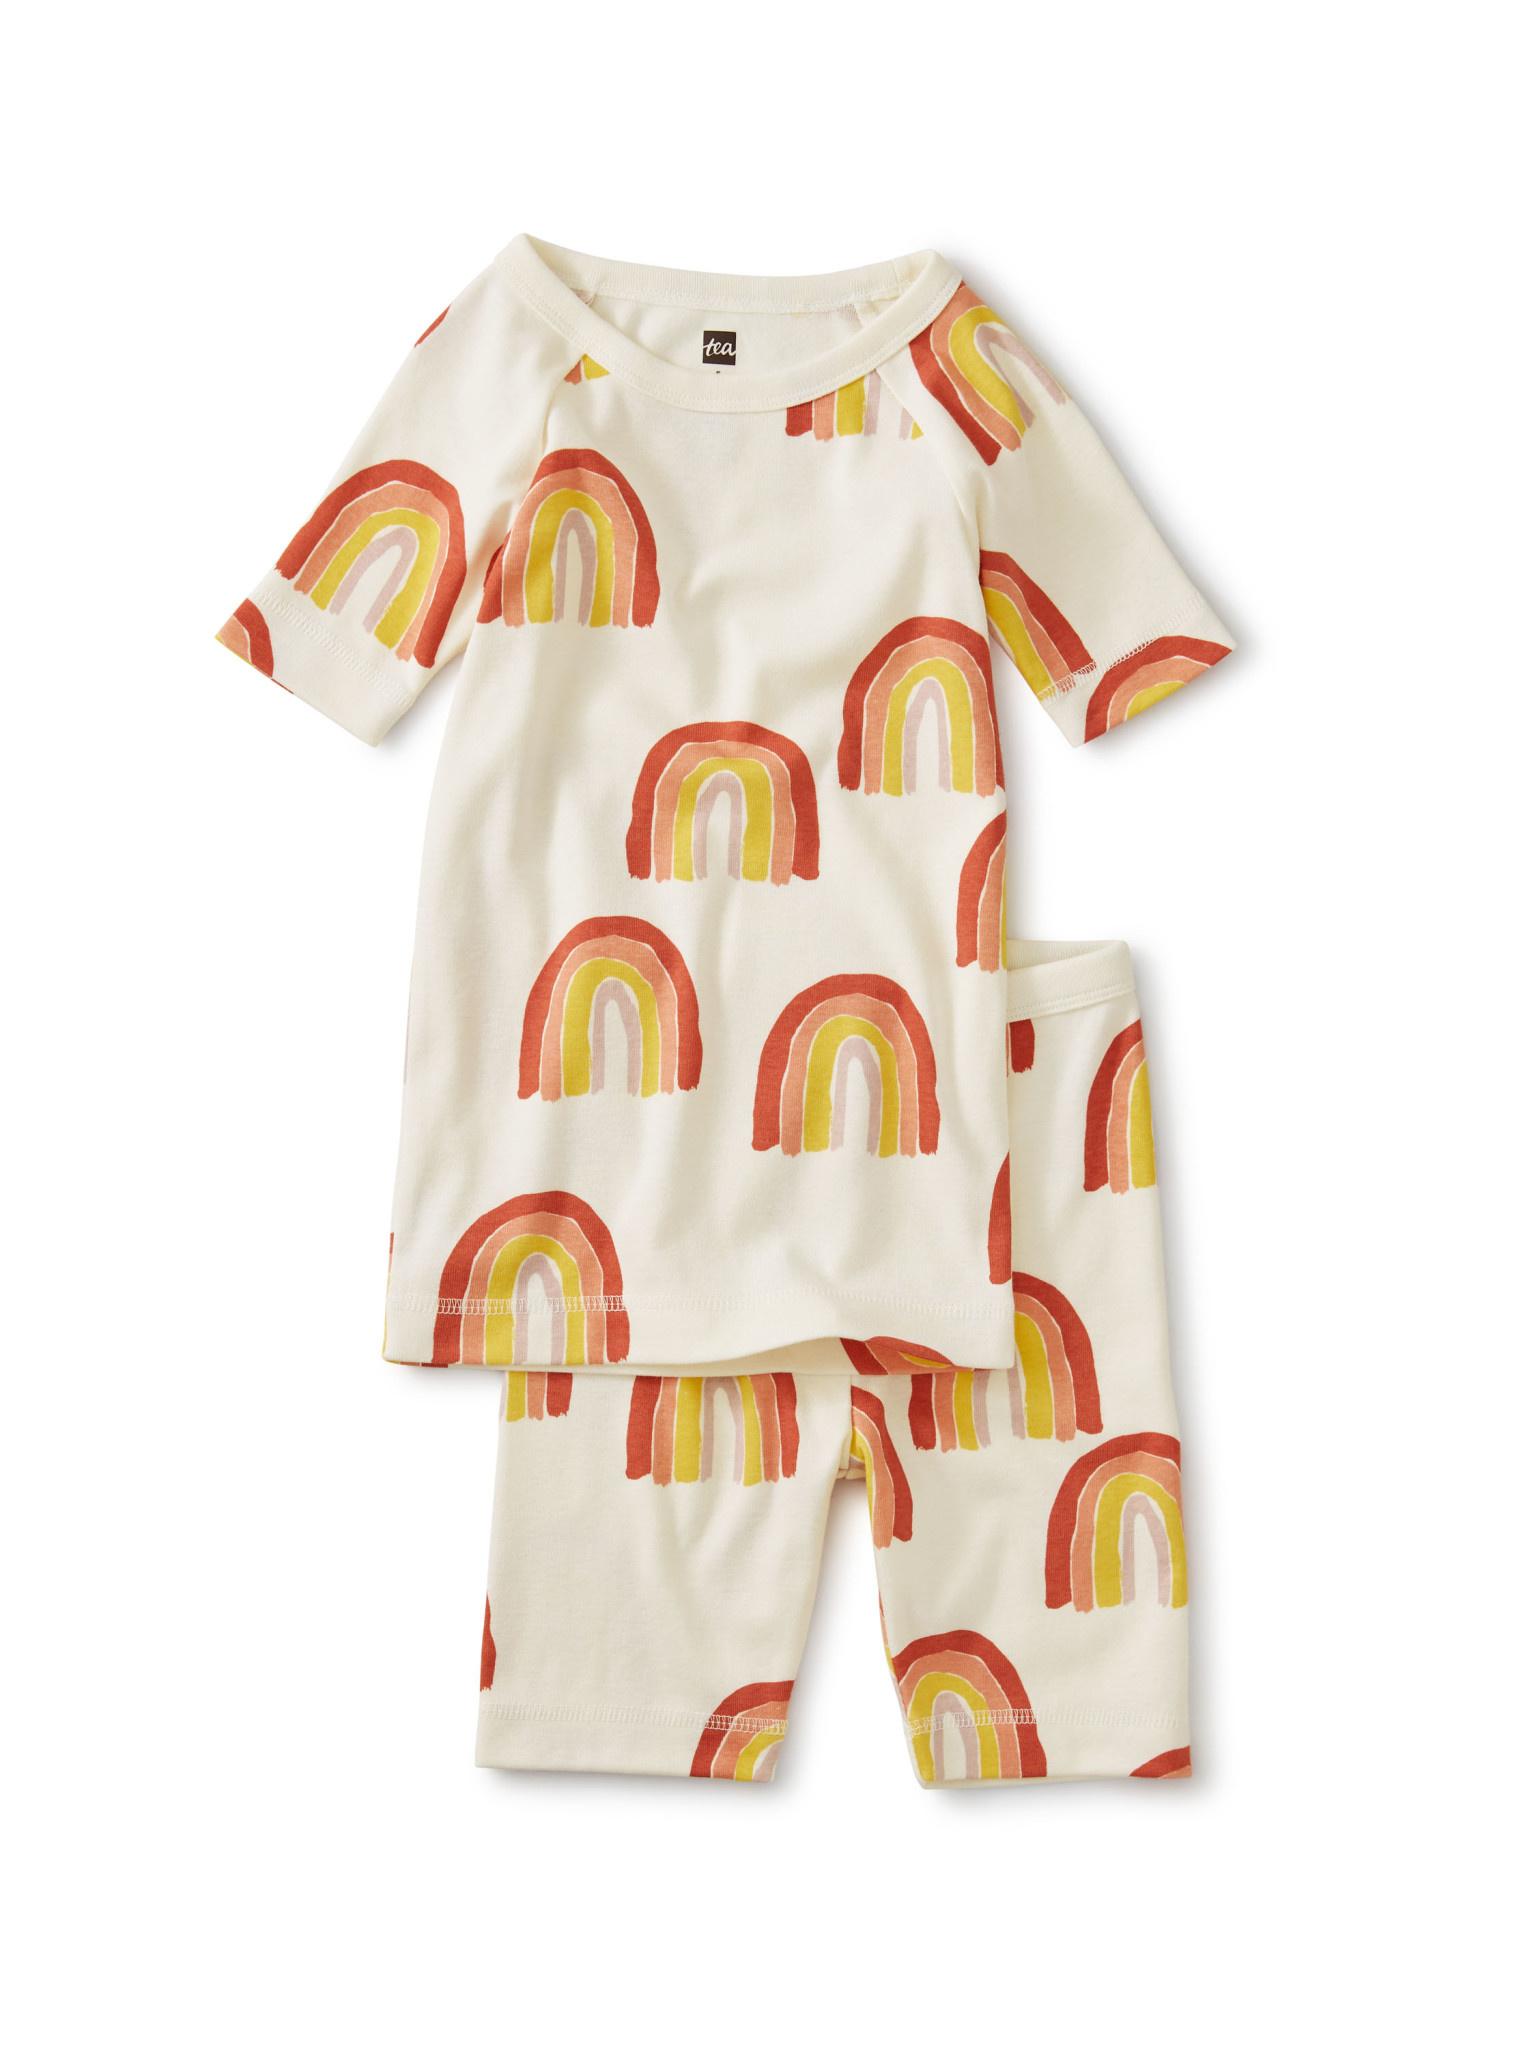 Tea Collection Rainbow Shortie Pajamas